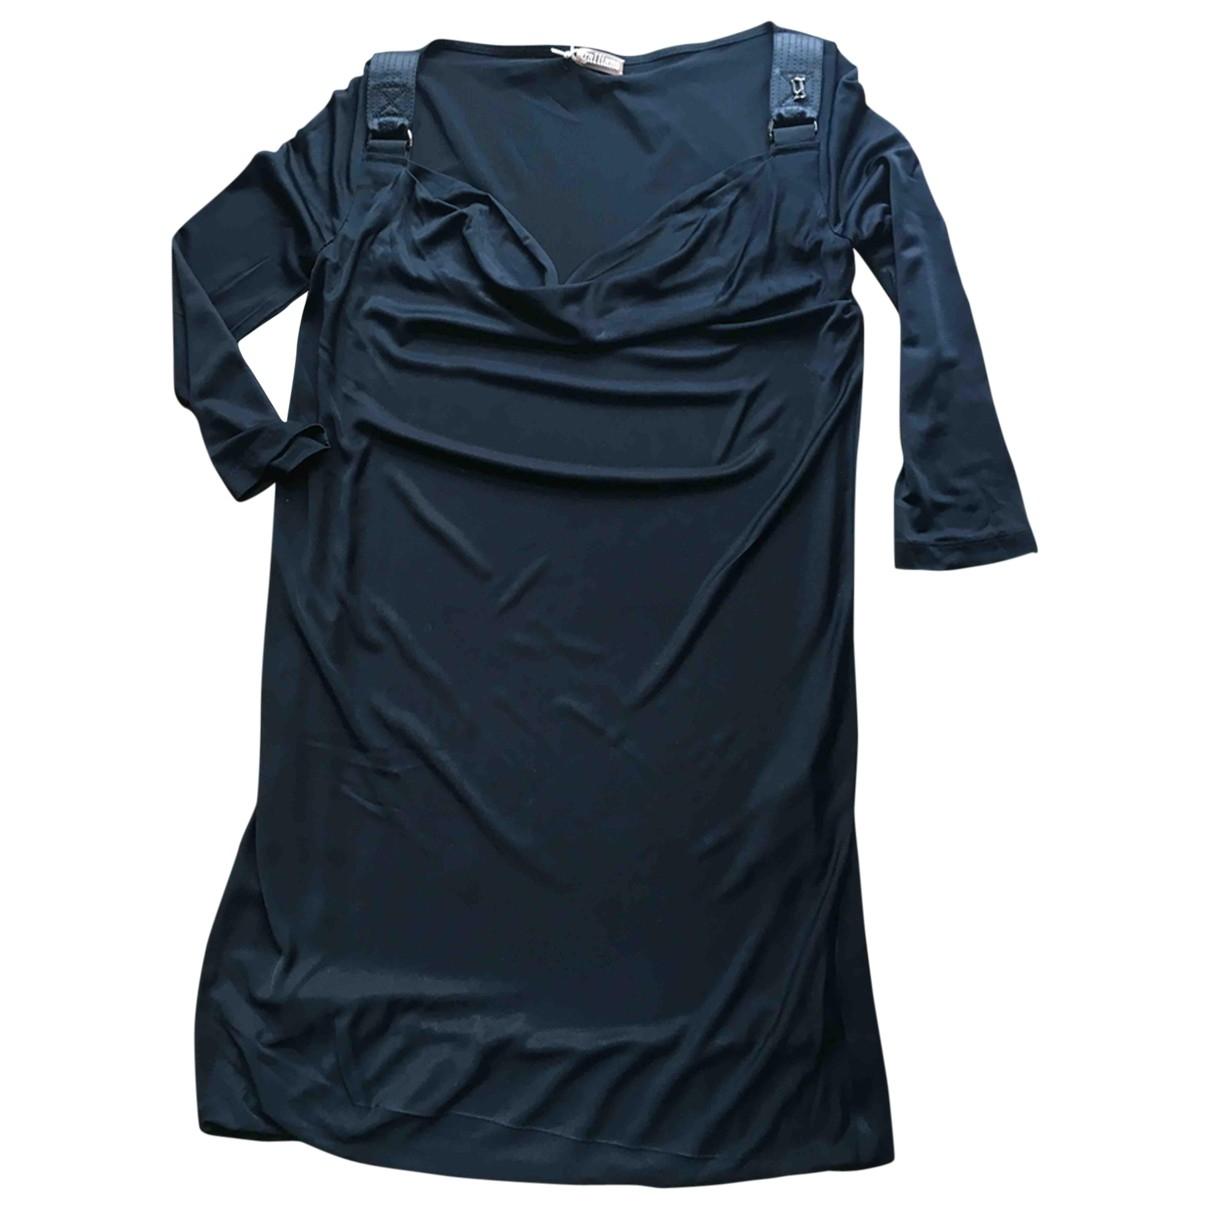 Galliano - Robe   pour femme - noir